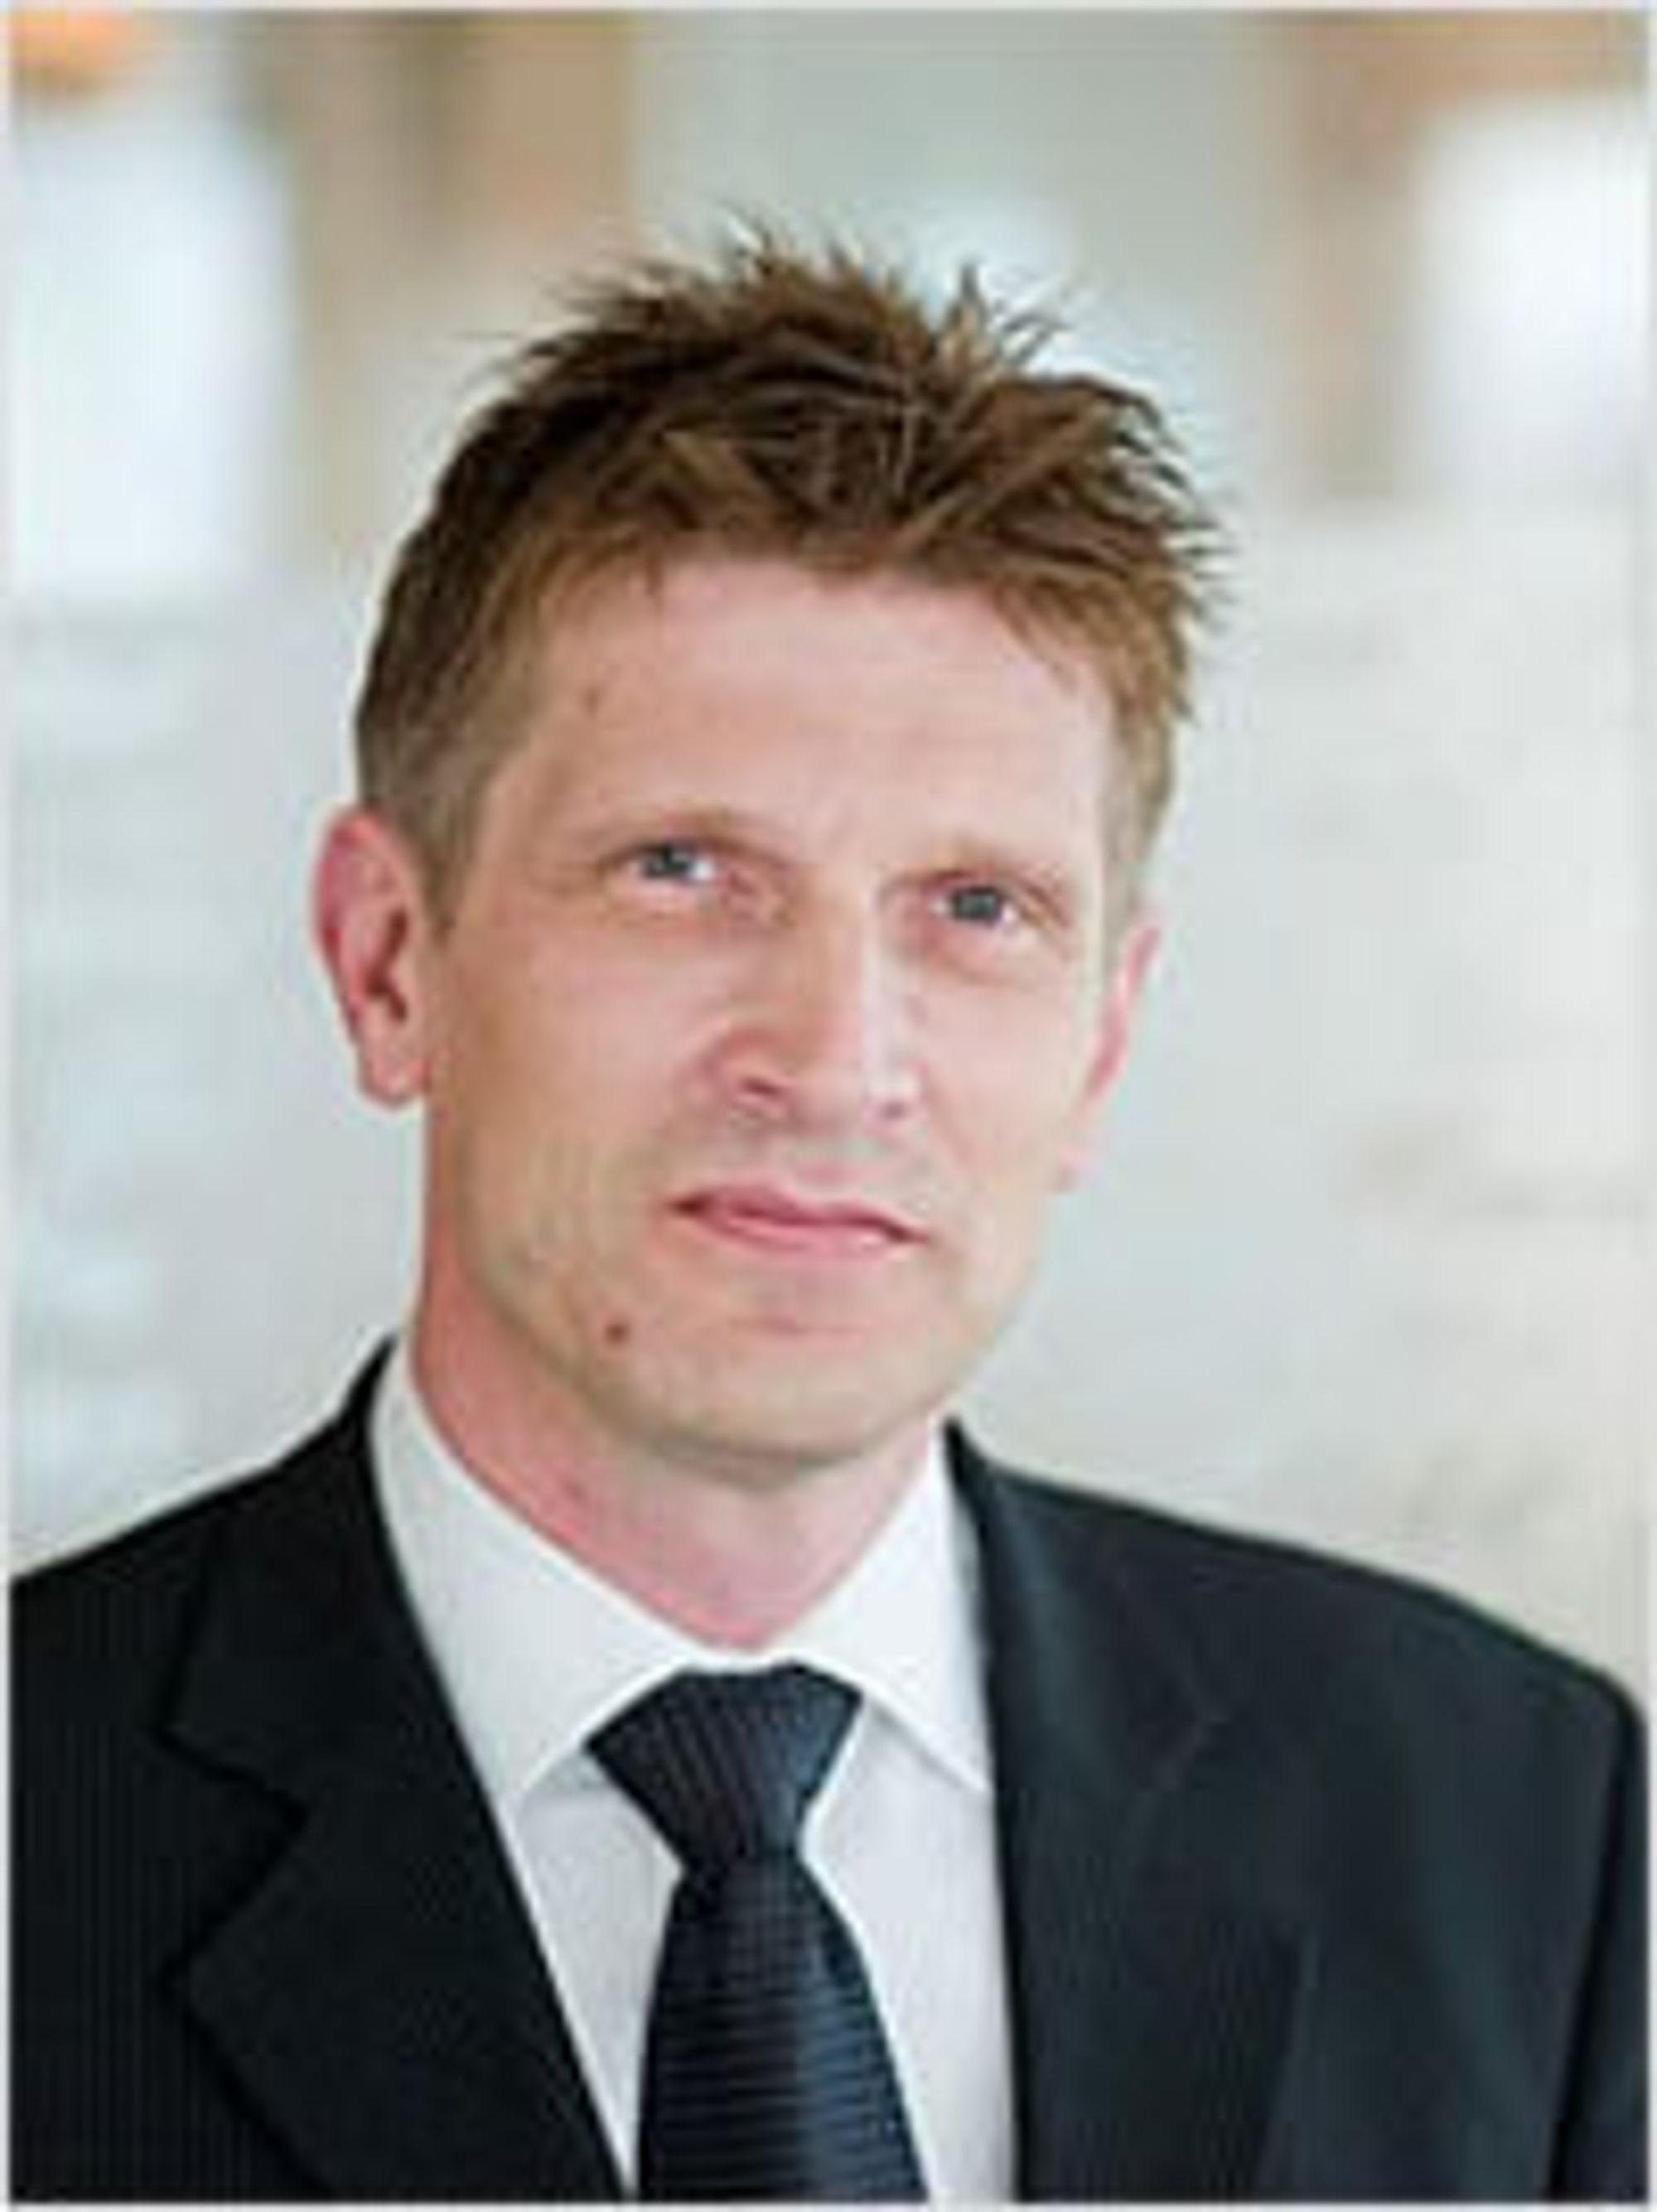 Raymond Olaussen, Fujitsu Norge.